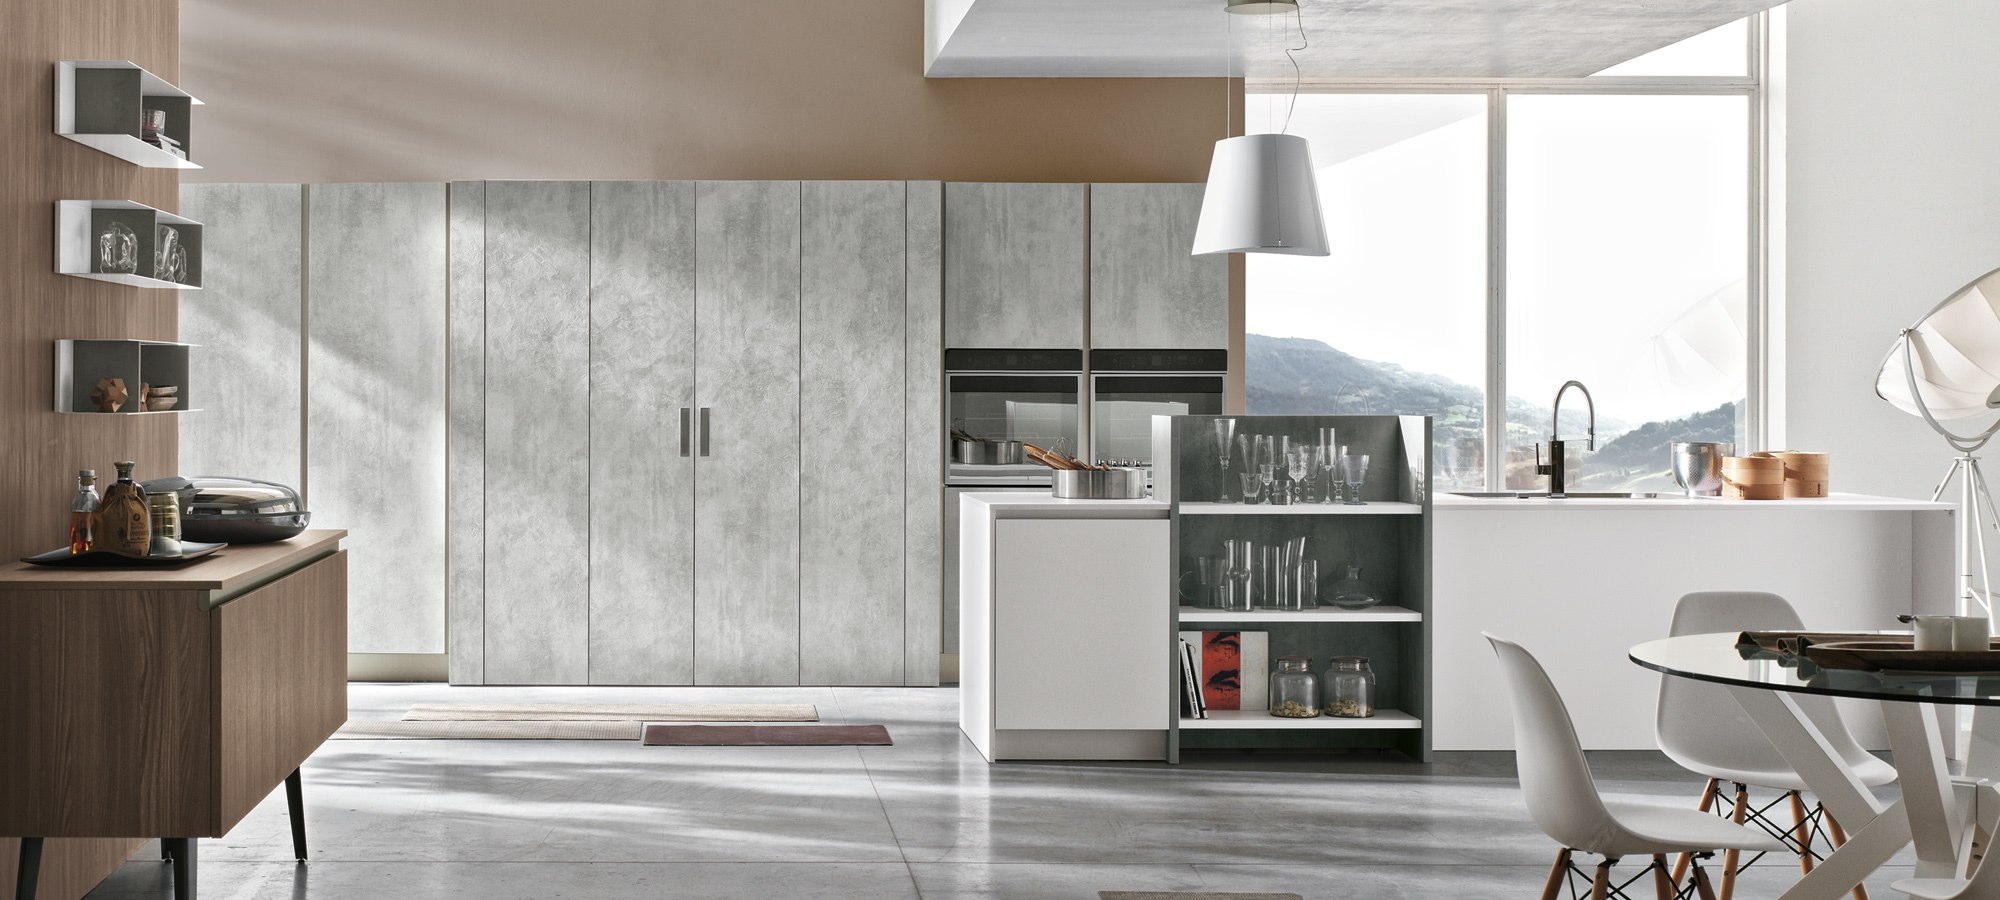 Modern Kitchen Renevotions Sydney - Eurolife